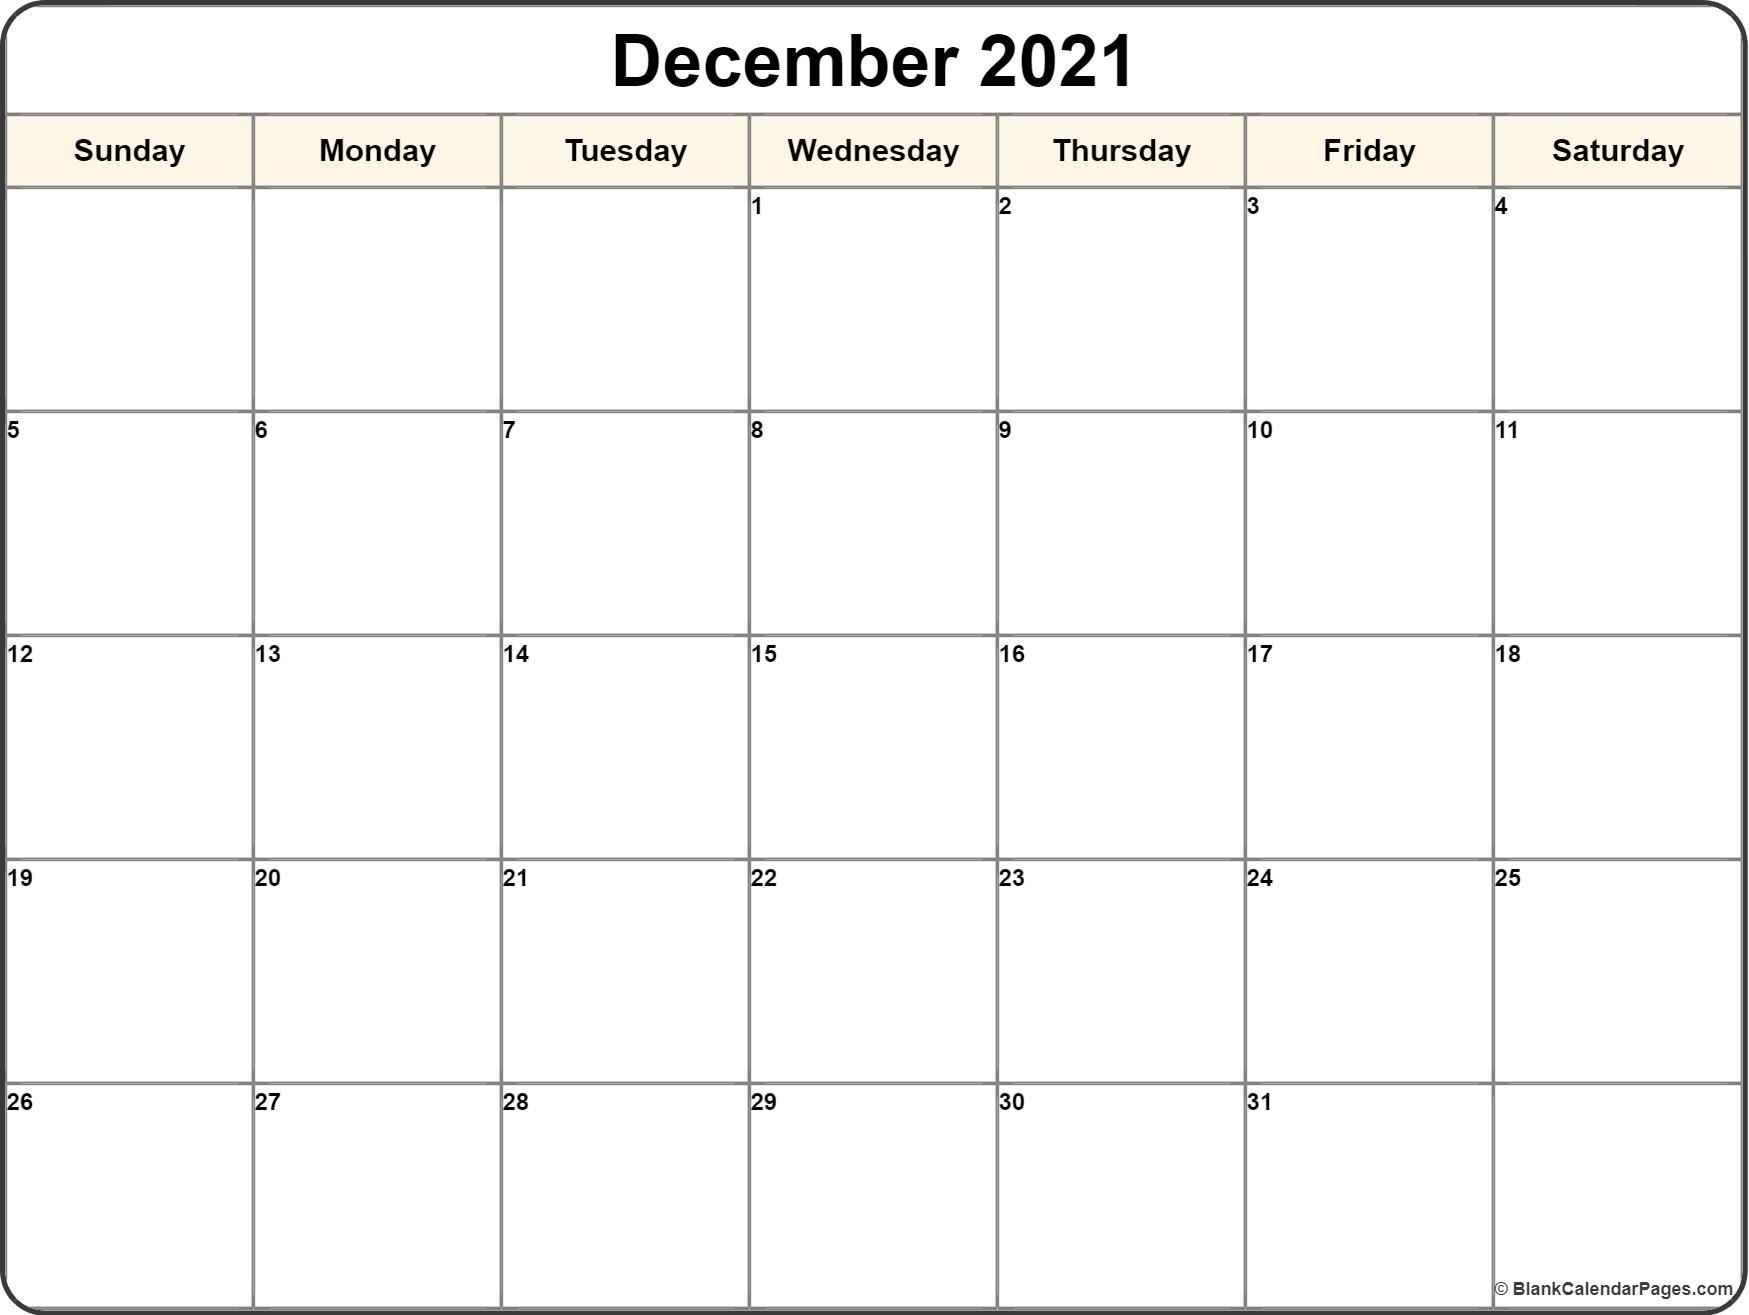 December 2021 Calendar | 56+ Templates Of 2021 Printable